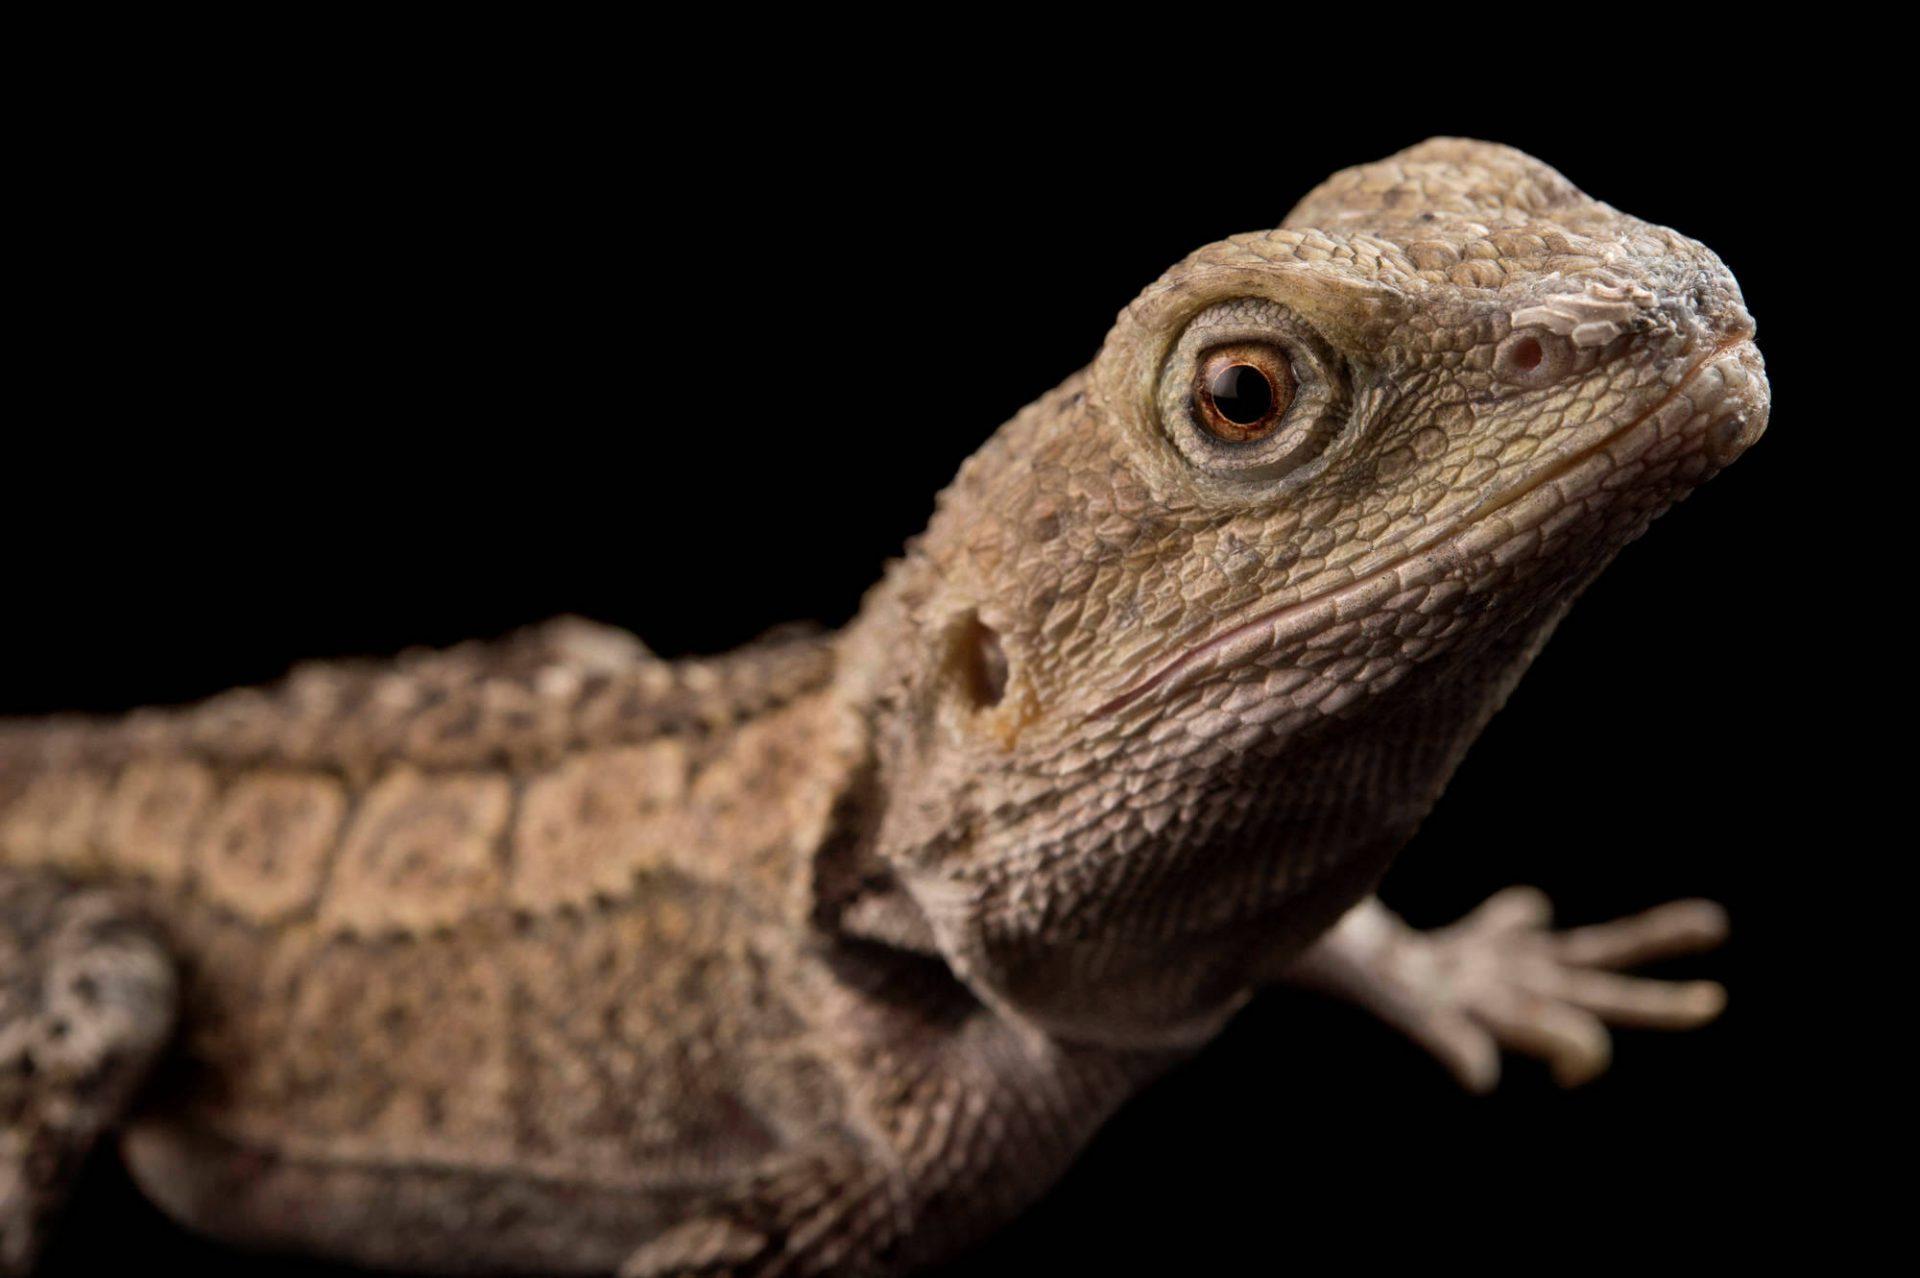 Picture of a jacky dragon (Amphibolurus muricatus) at the Healesville Sanctuary.